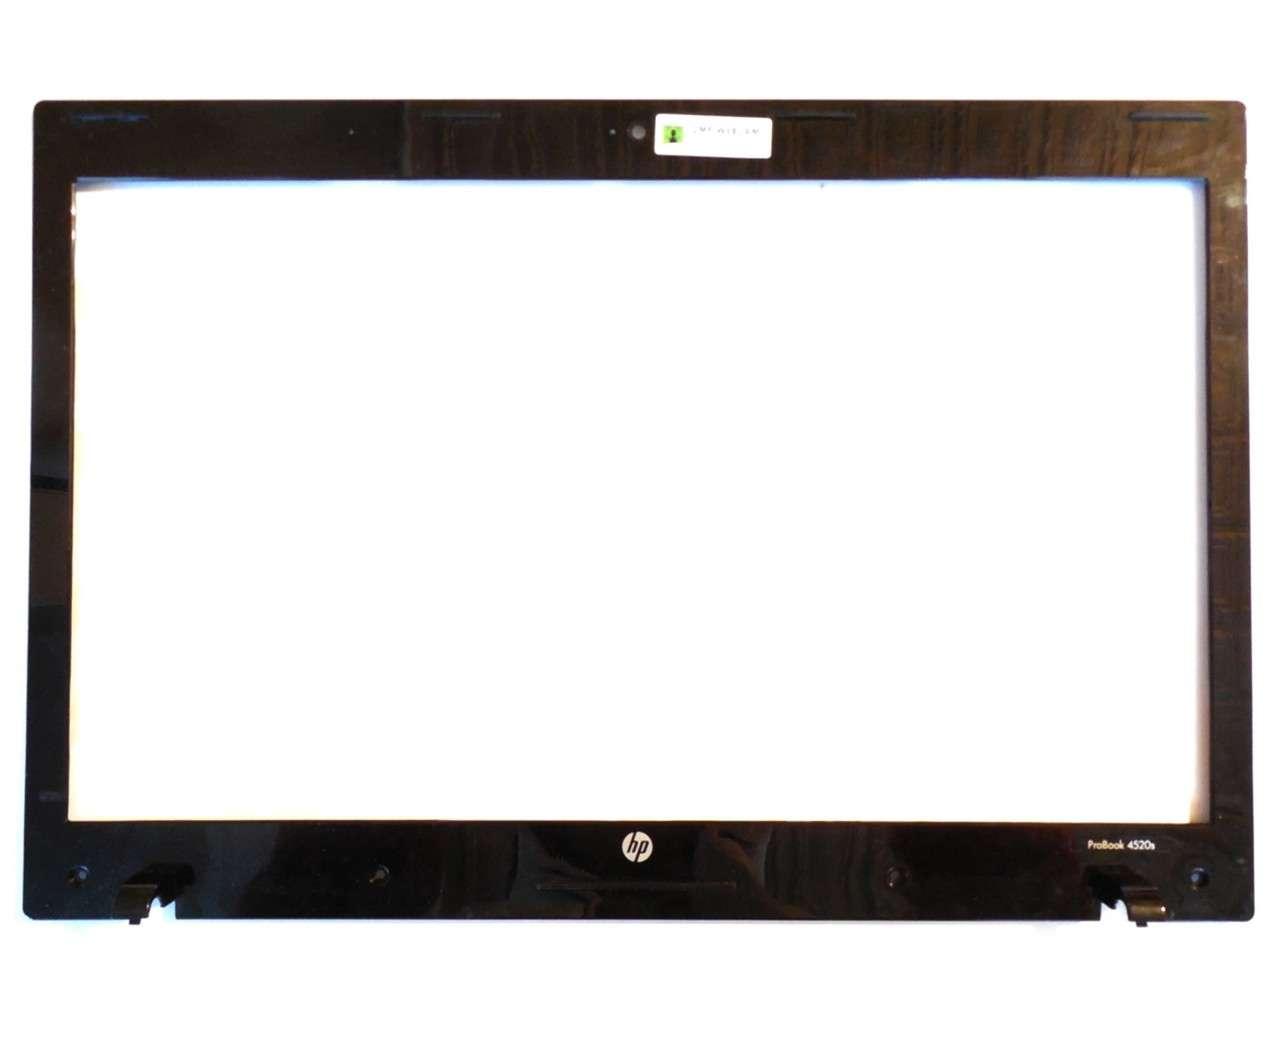 Rama Display HP 41 4GK01 003 Bezel Front Cover Neagra imagine powerlaptop.ro 2021